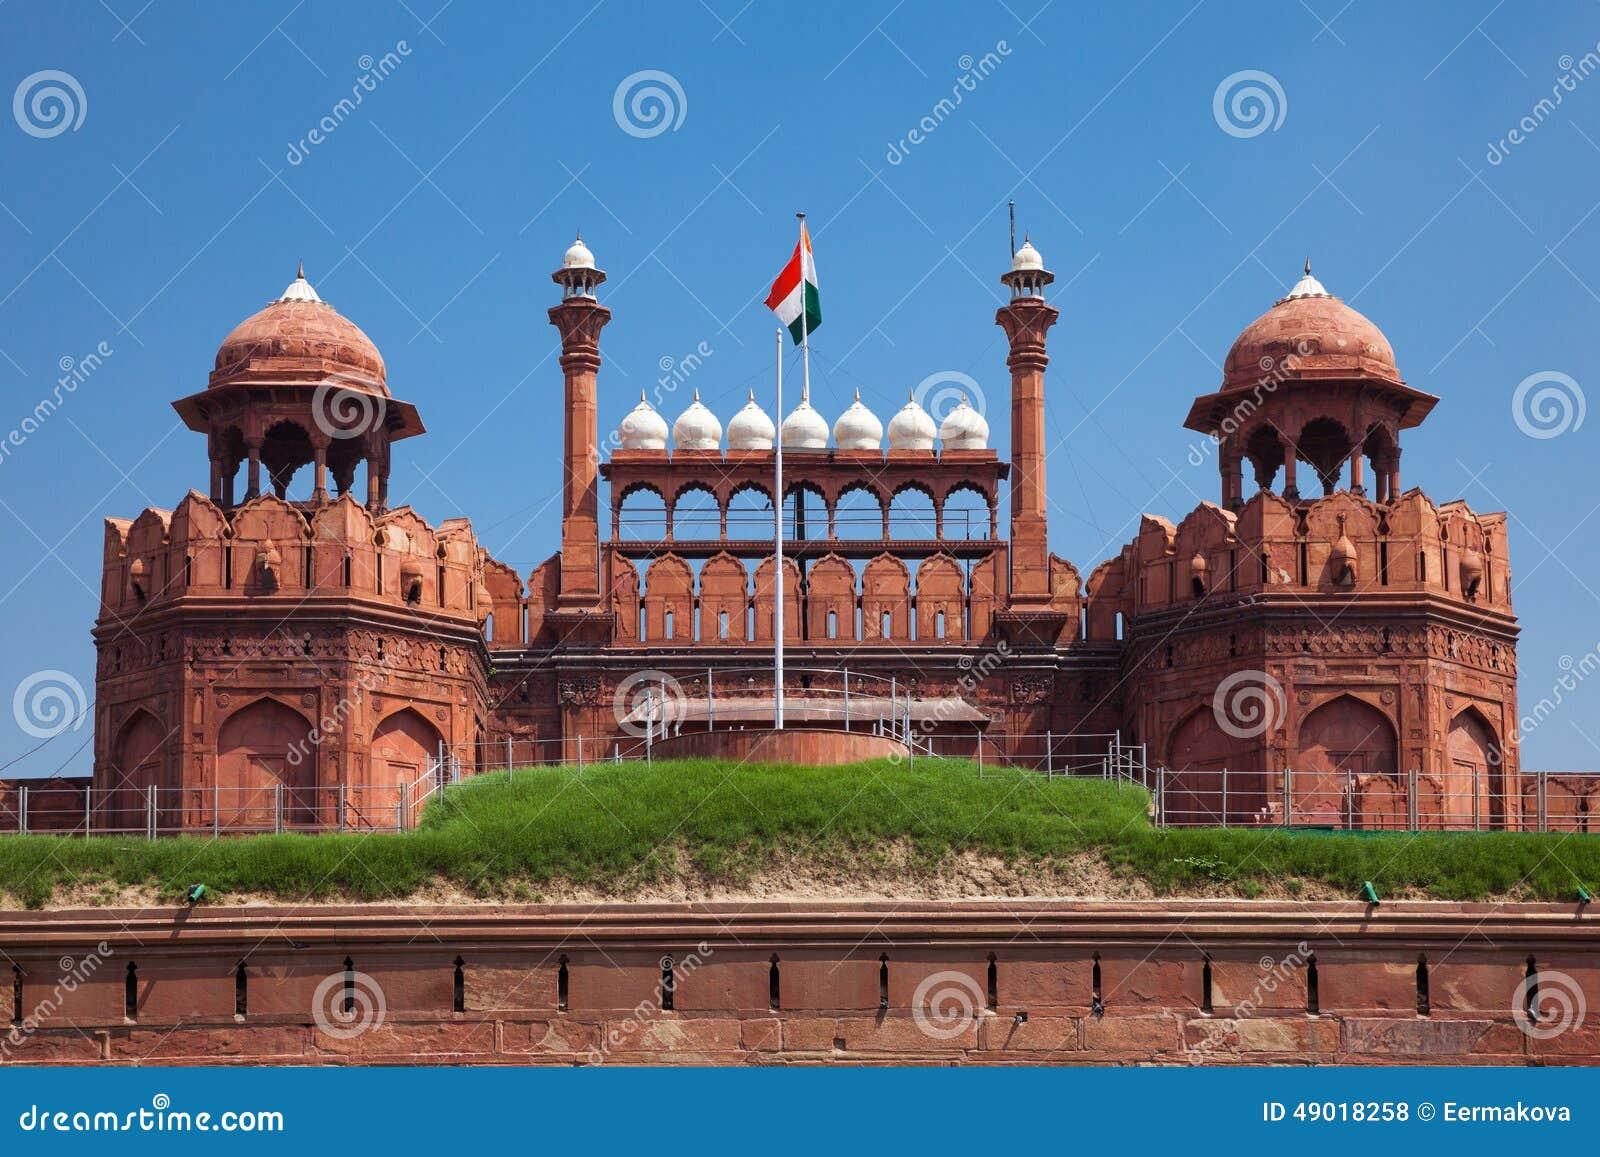 Fortificazione rossa a Delhi